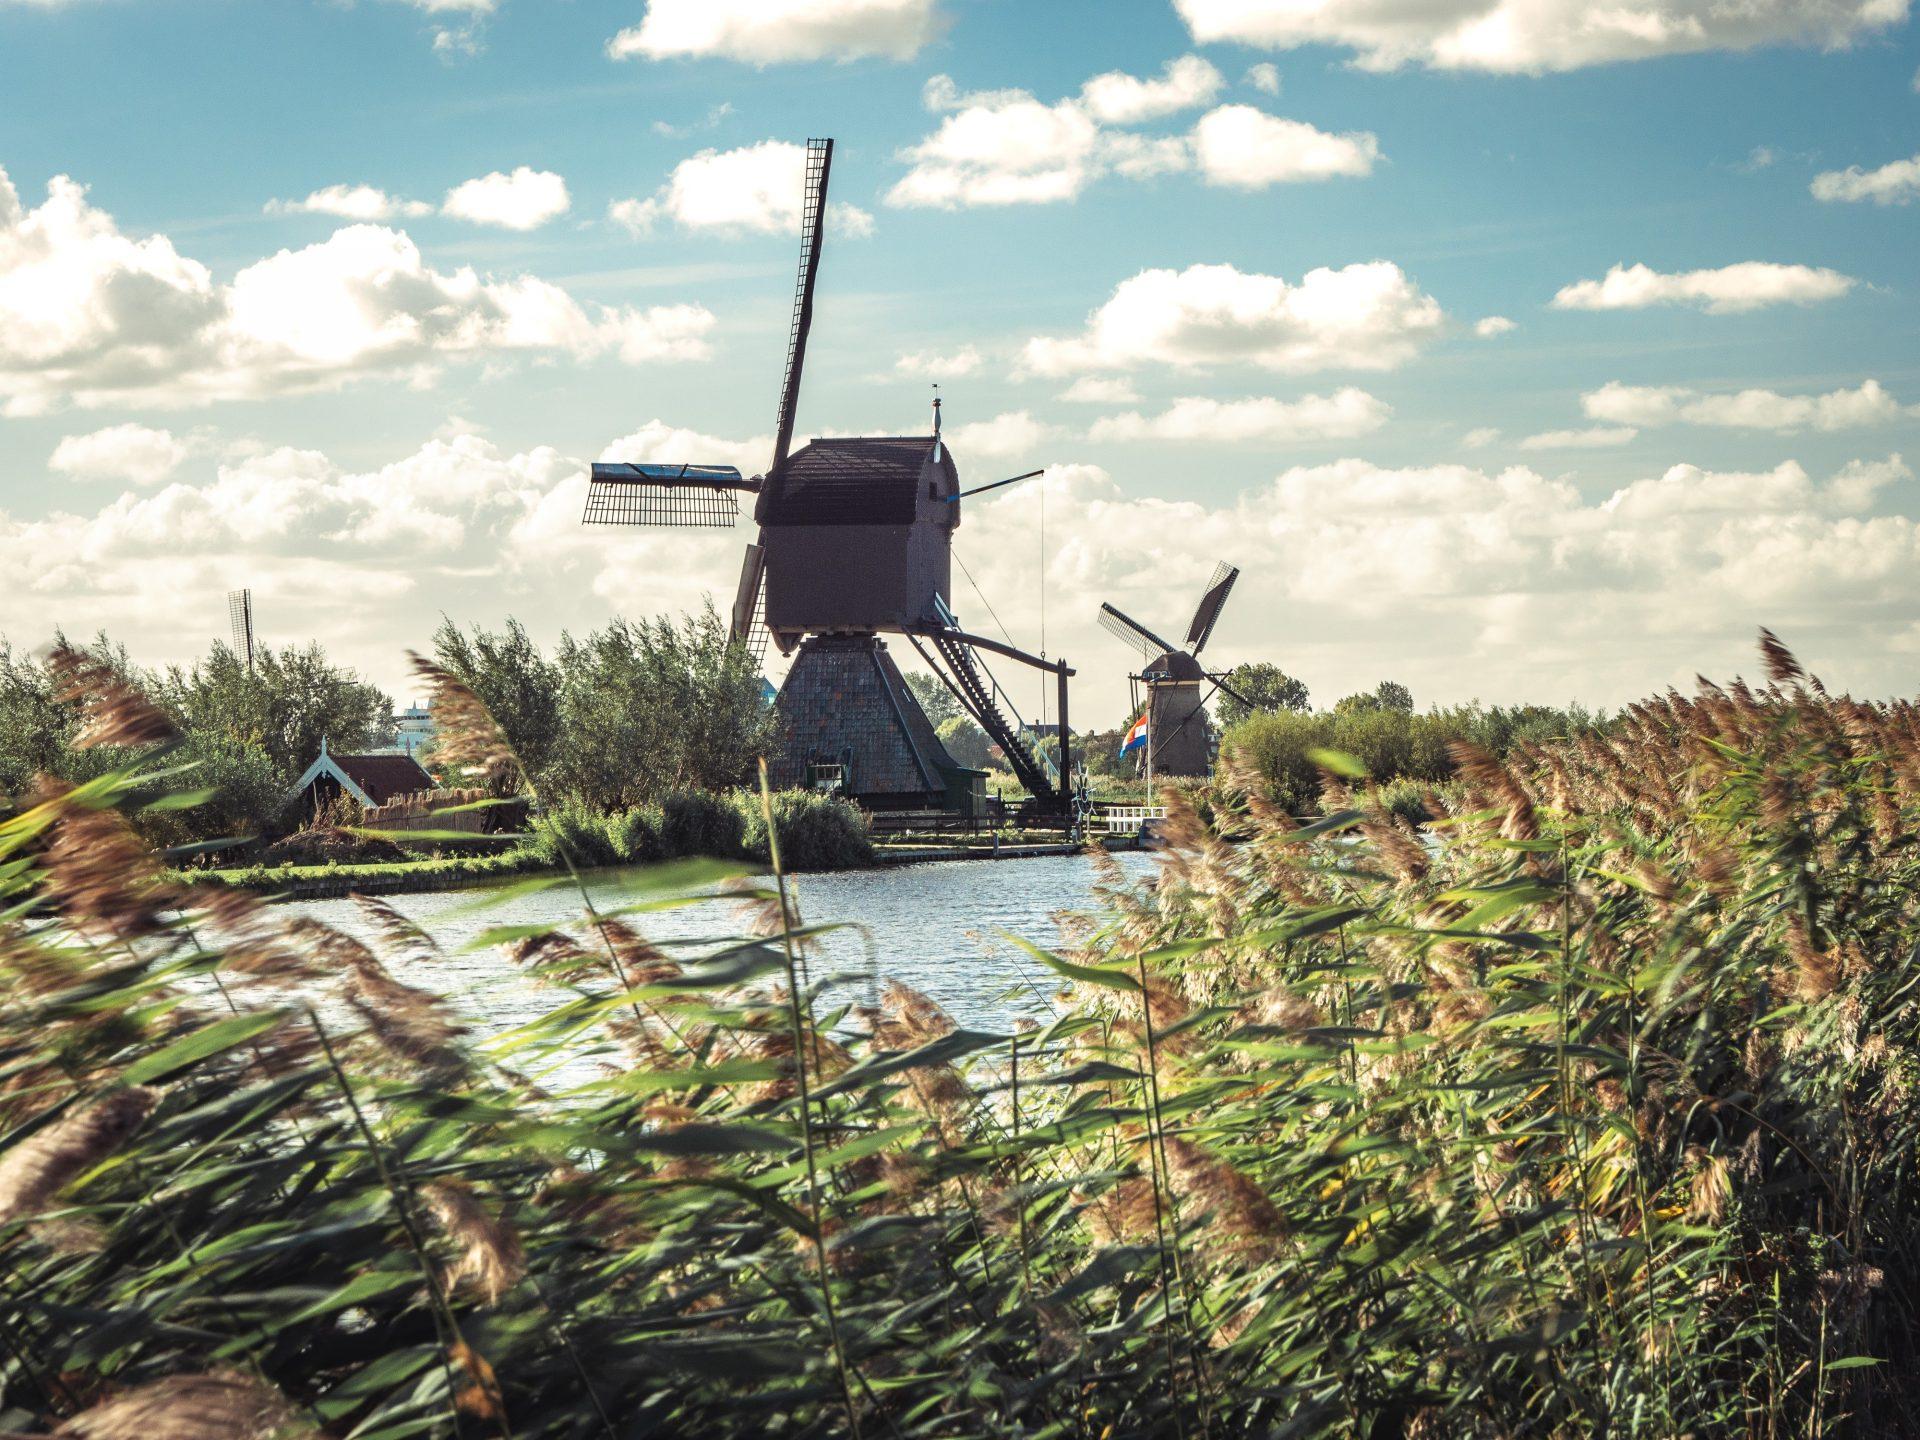 visite Dordrecht